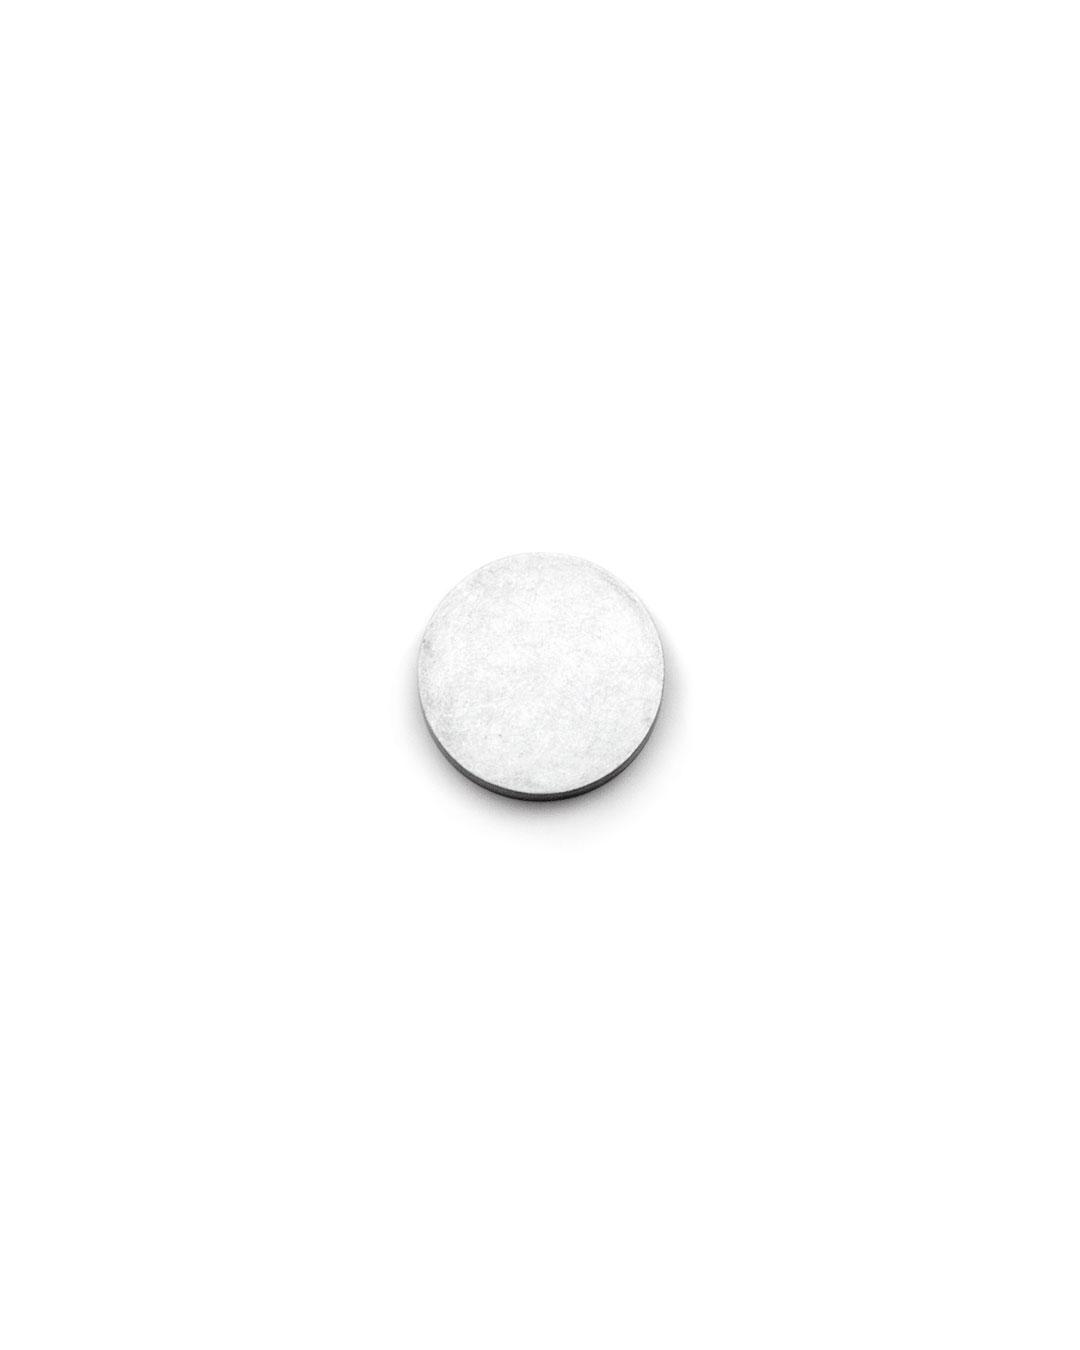 Junwon Jung, untitled, 2015, ring; titan zinc, silver, ø 27 x 5 mm, €610